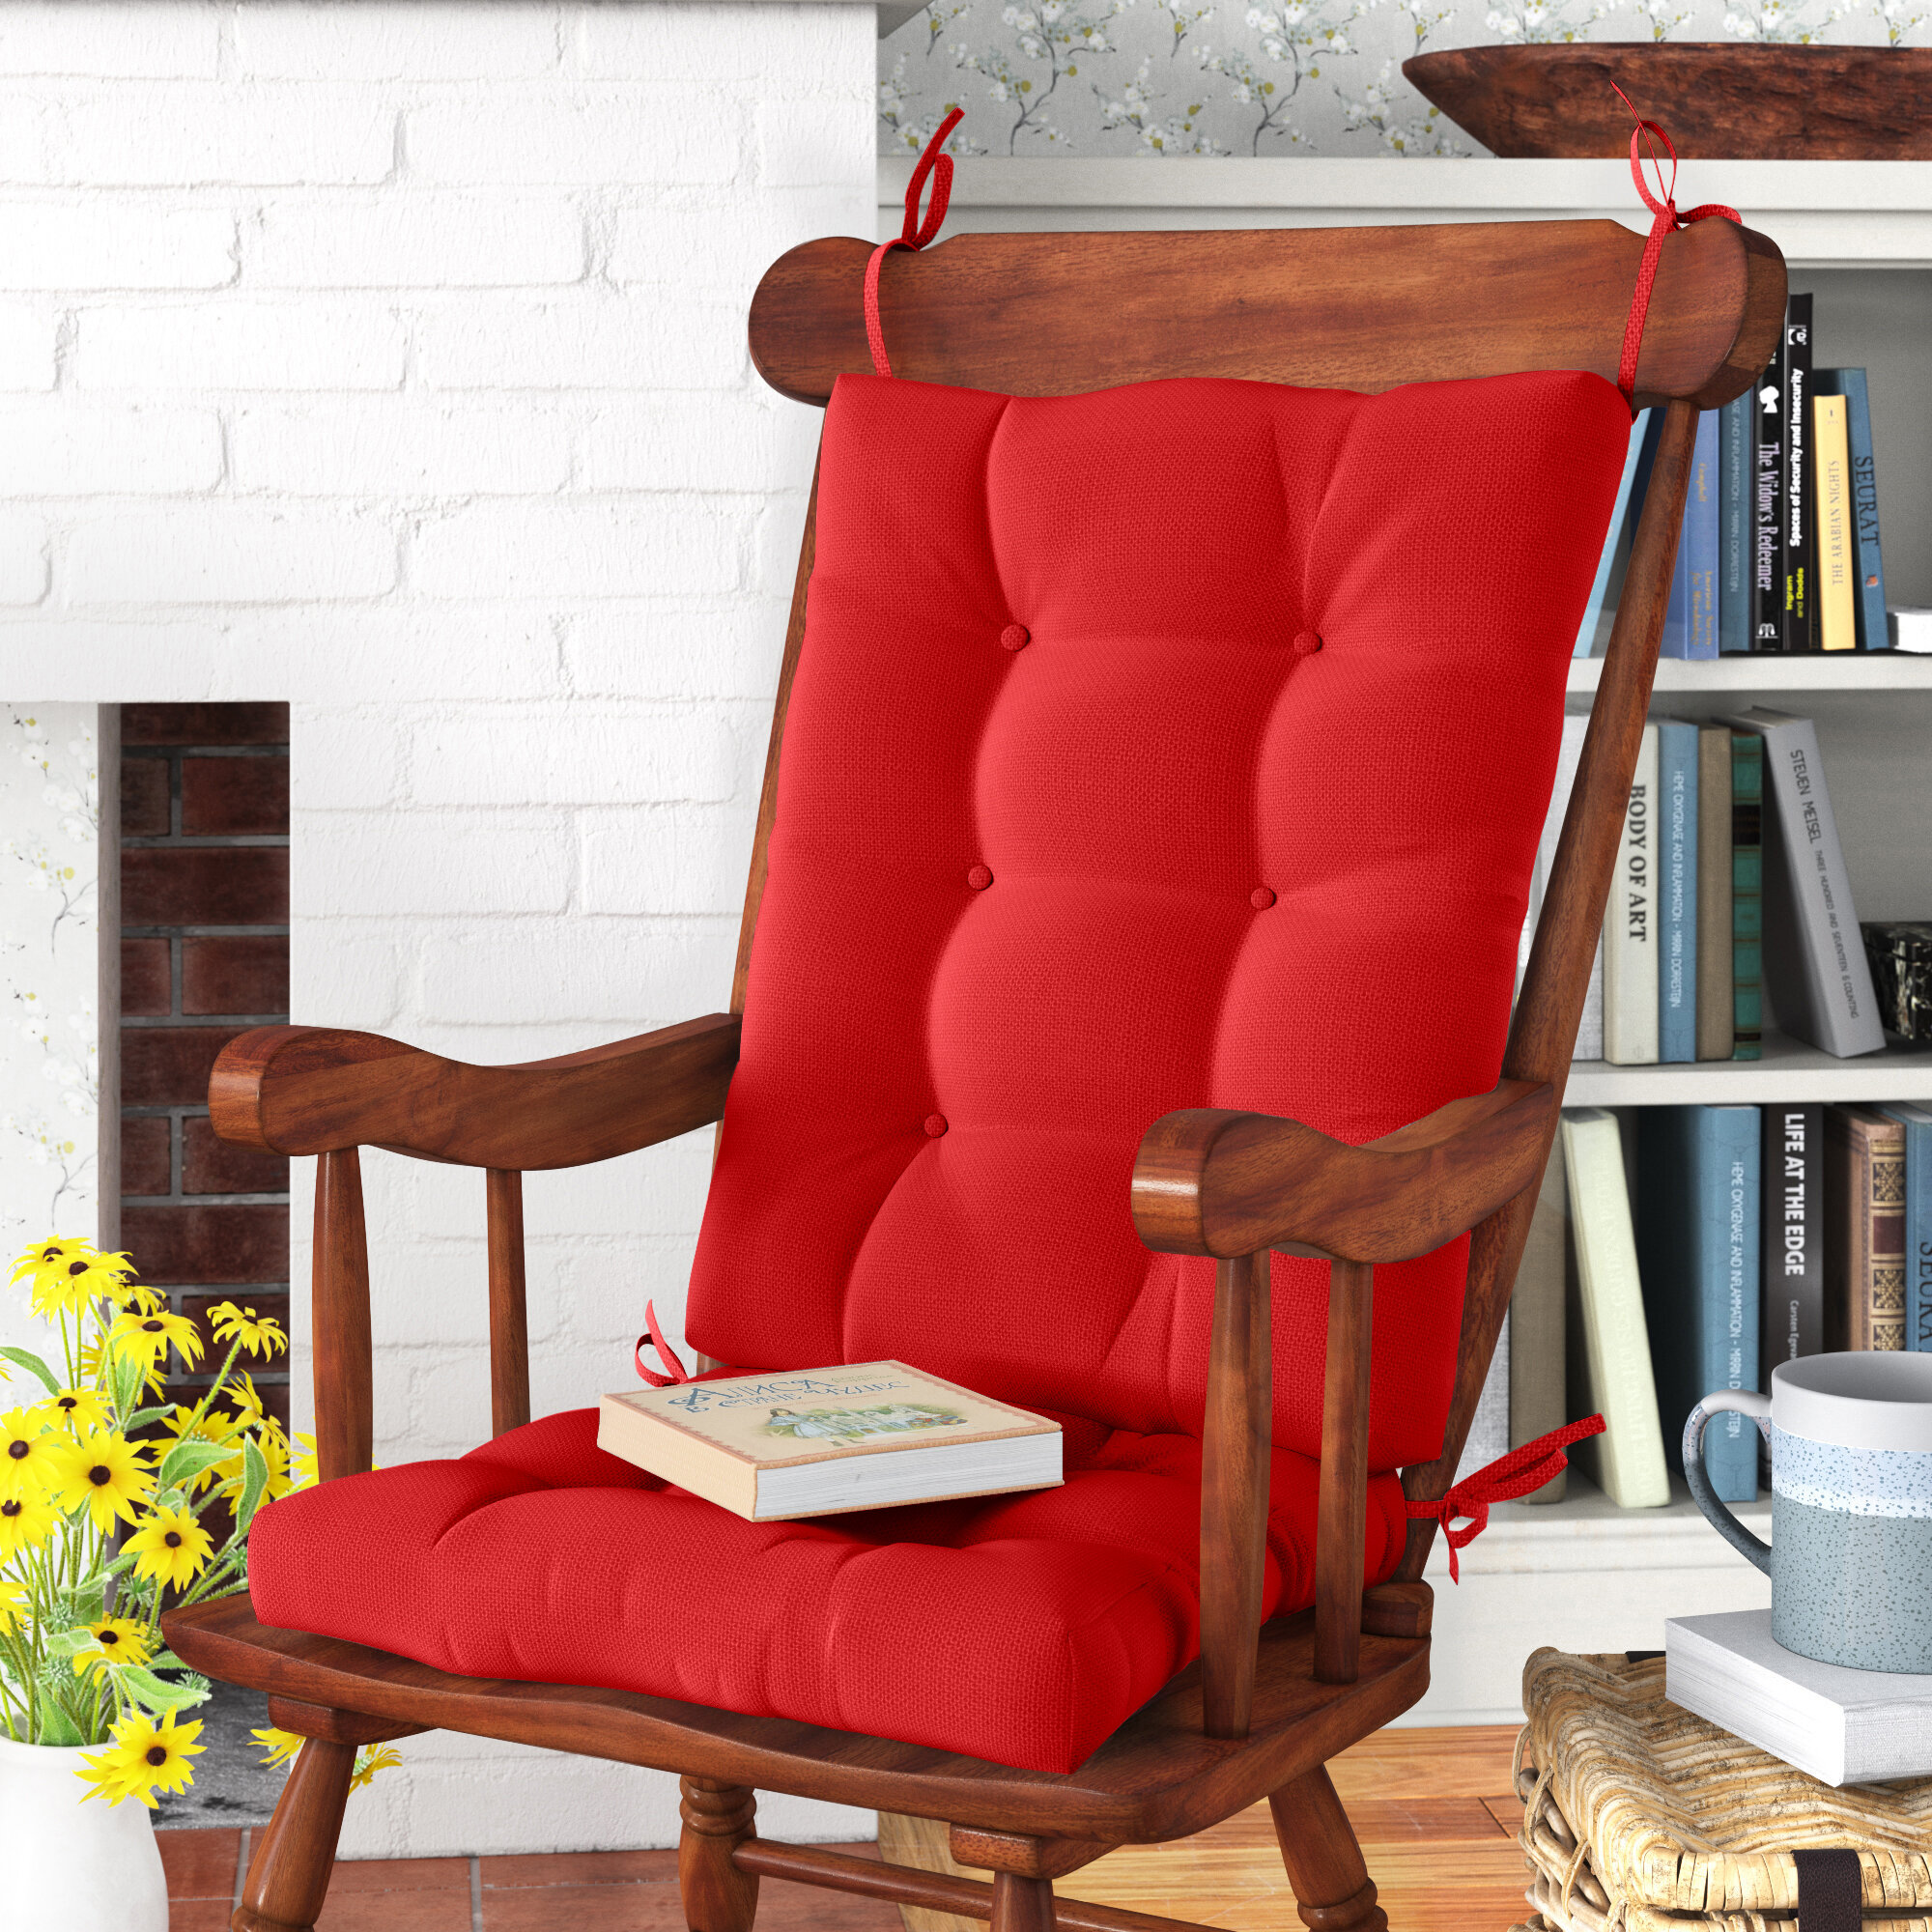 Hot Pink Baby Doll Bedding Rocking Chair Cushion Pad Set